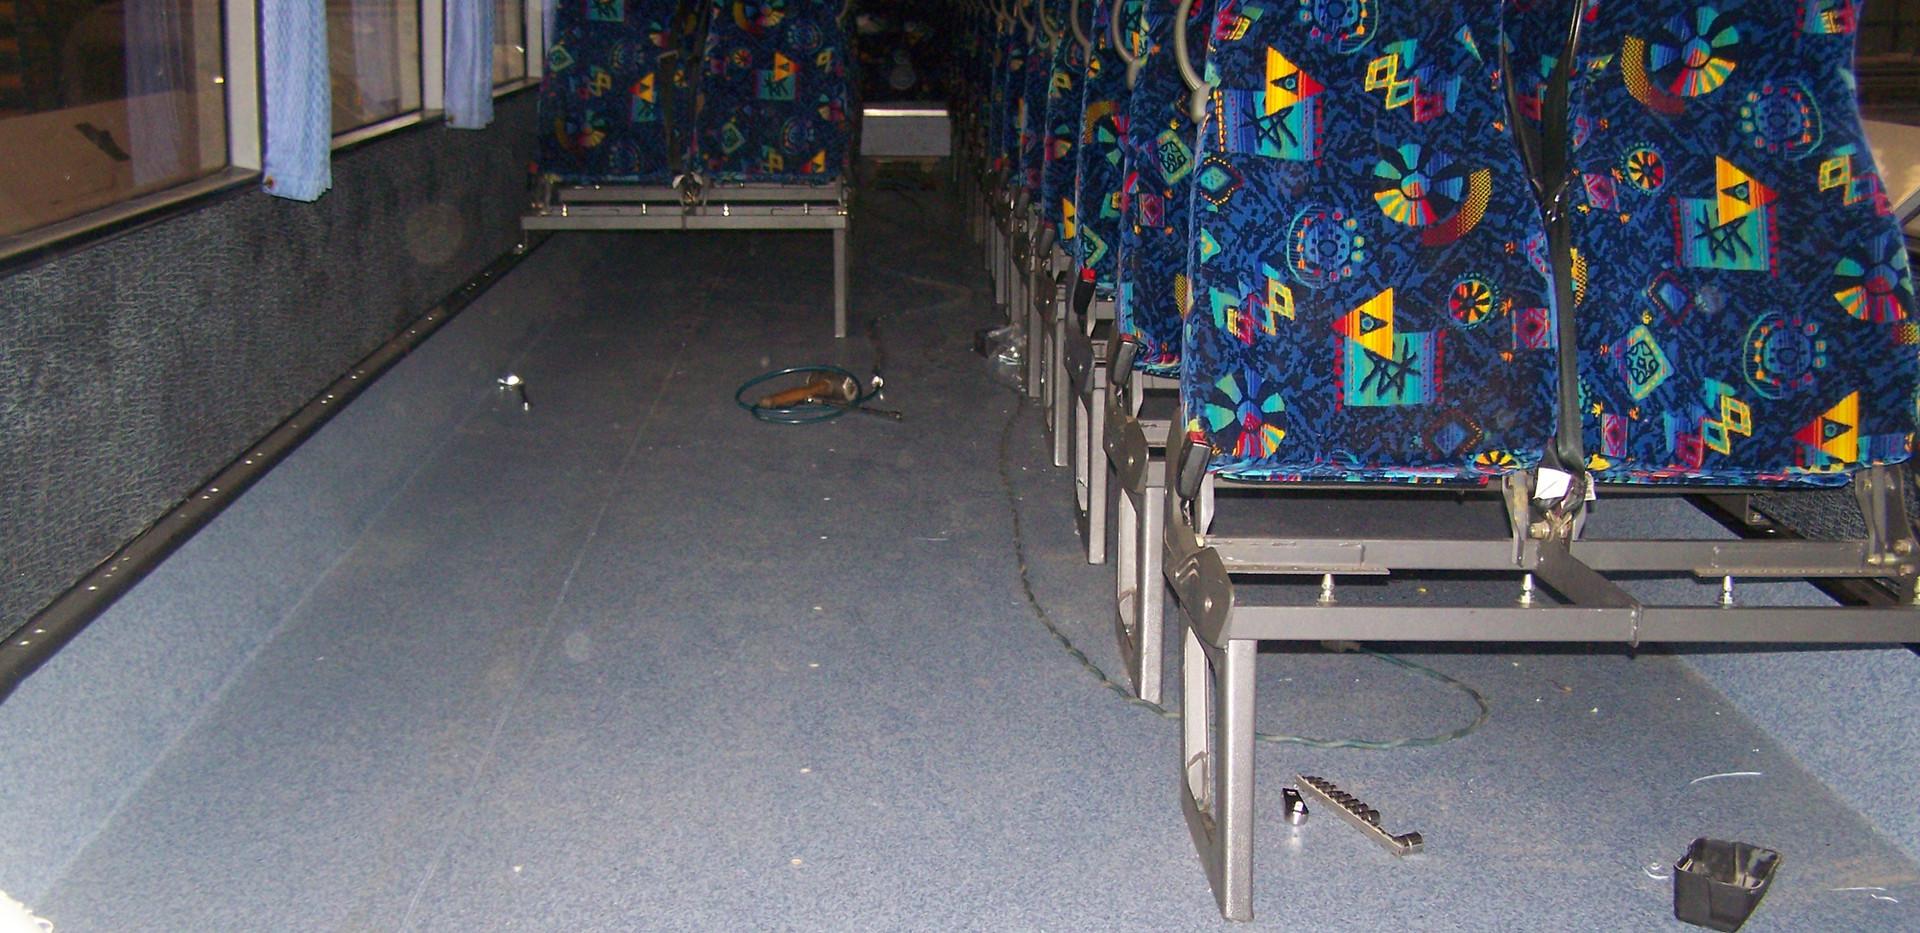 Autobus Floor and Seat06.JPG